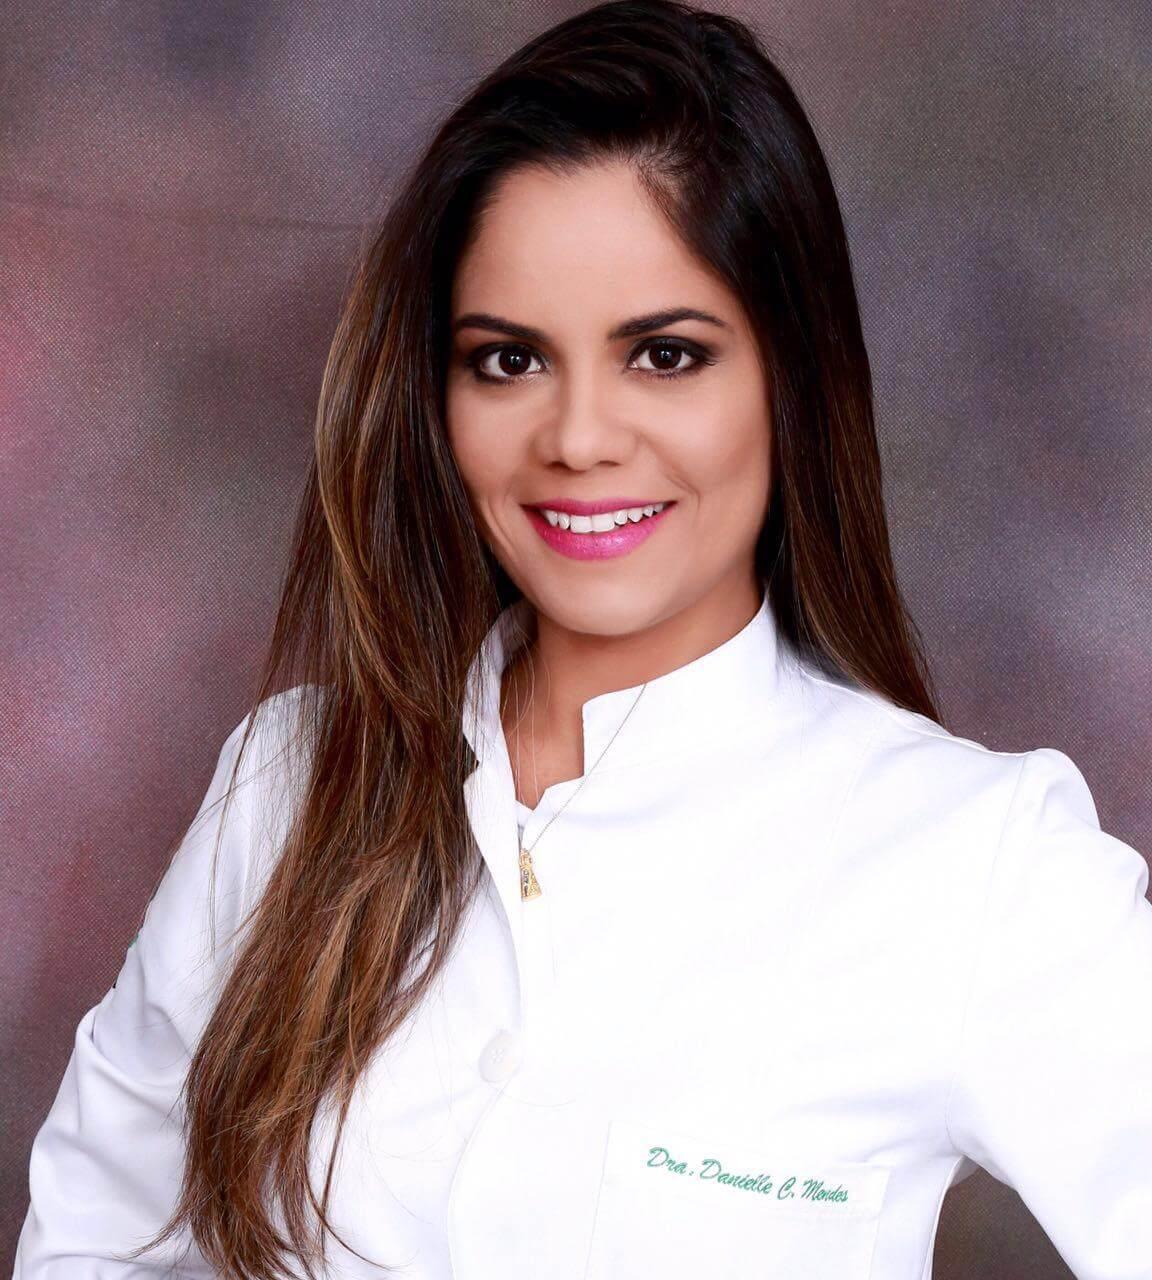 Dra. Danielle Mendes